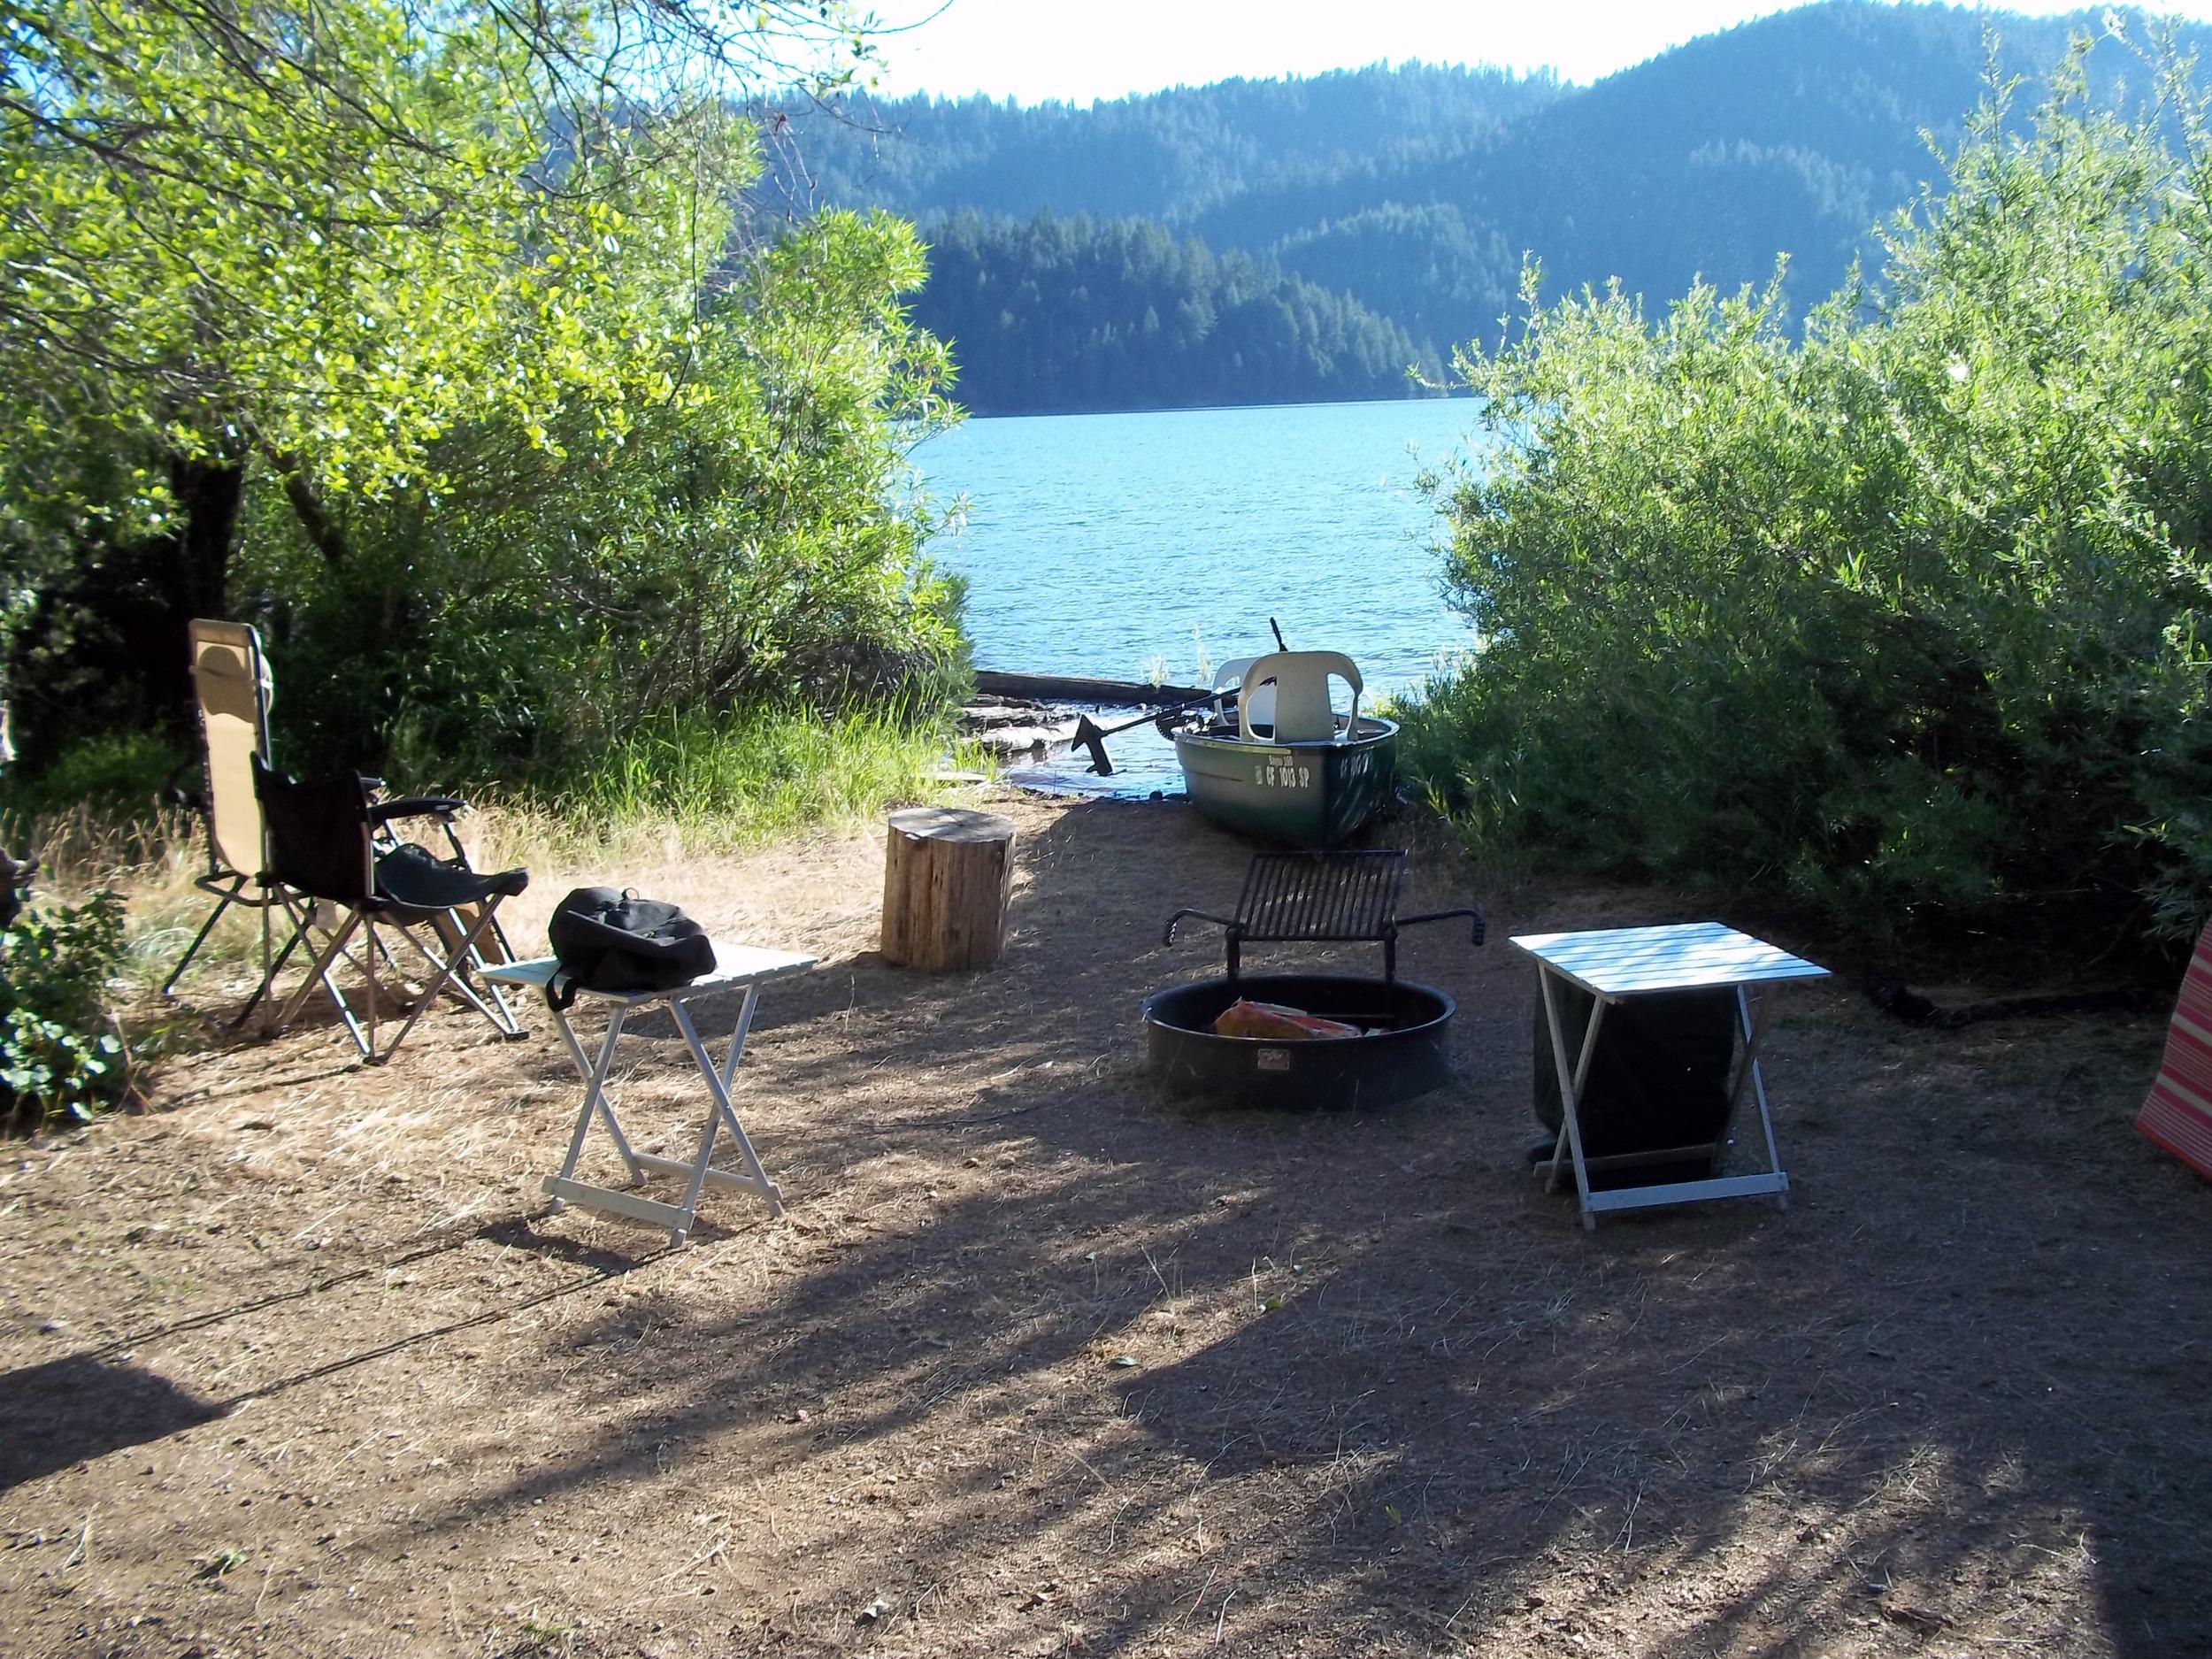 Lakefront campsites